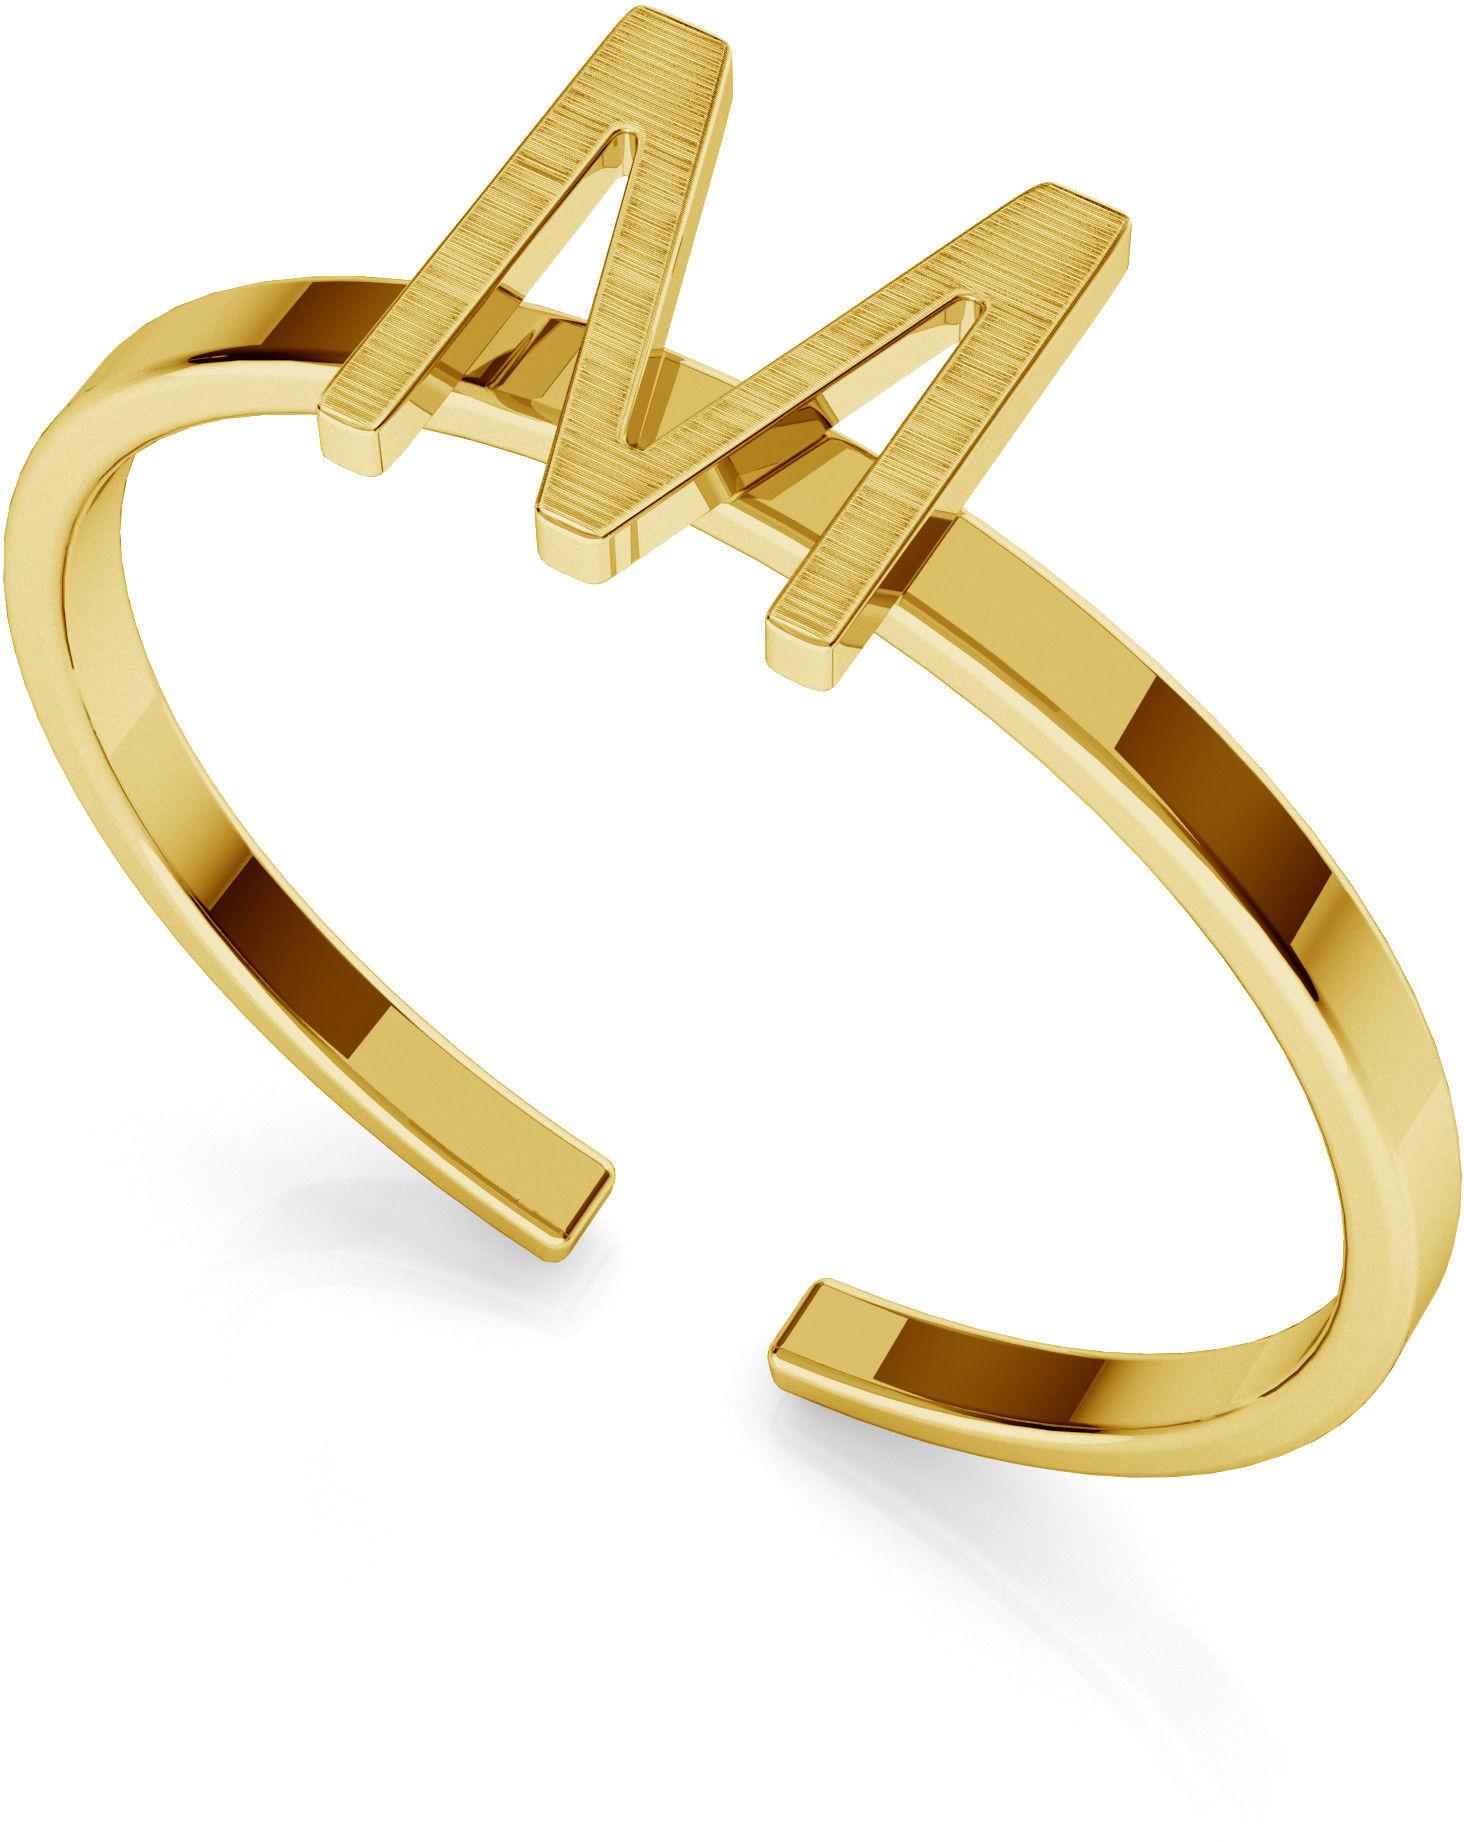 Srebrny pierścionek z literką My RING, srebro 925 : Litera - T, Srebro - kolor pokrycia - Pokrycie żółtym 18K złotem